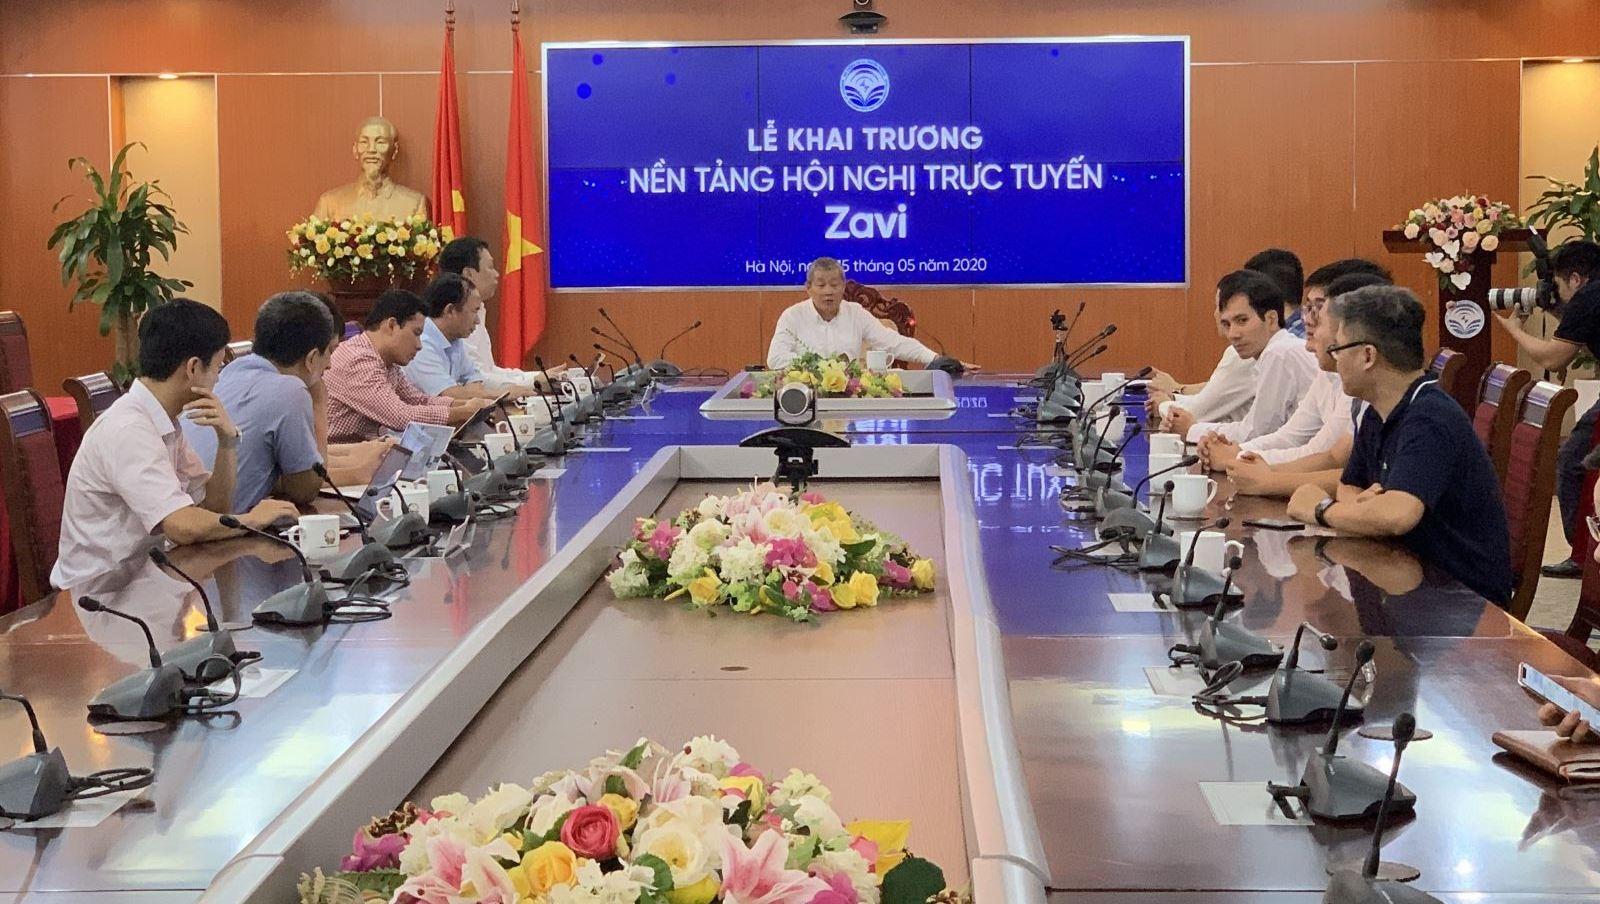 vietnams first online meeting platform zavi launched